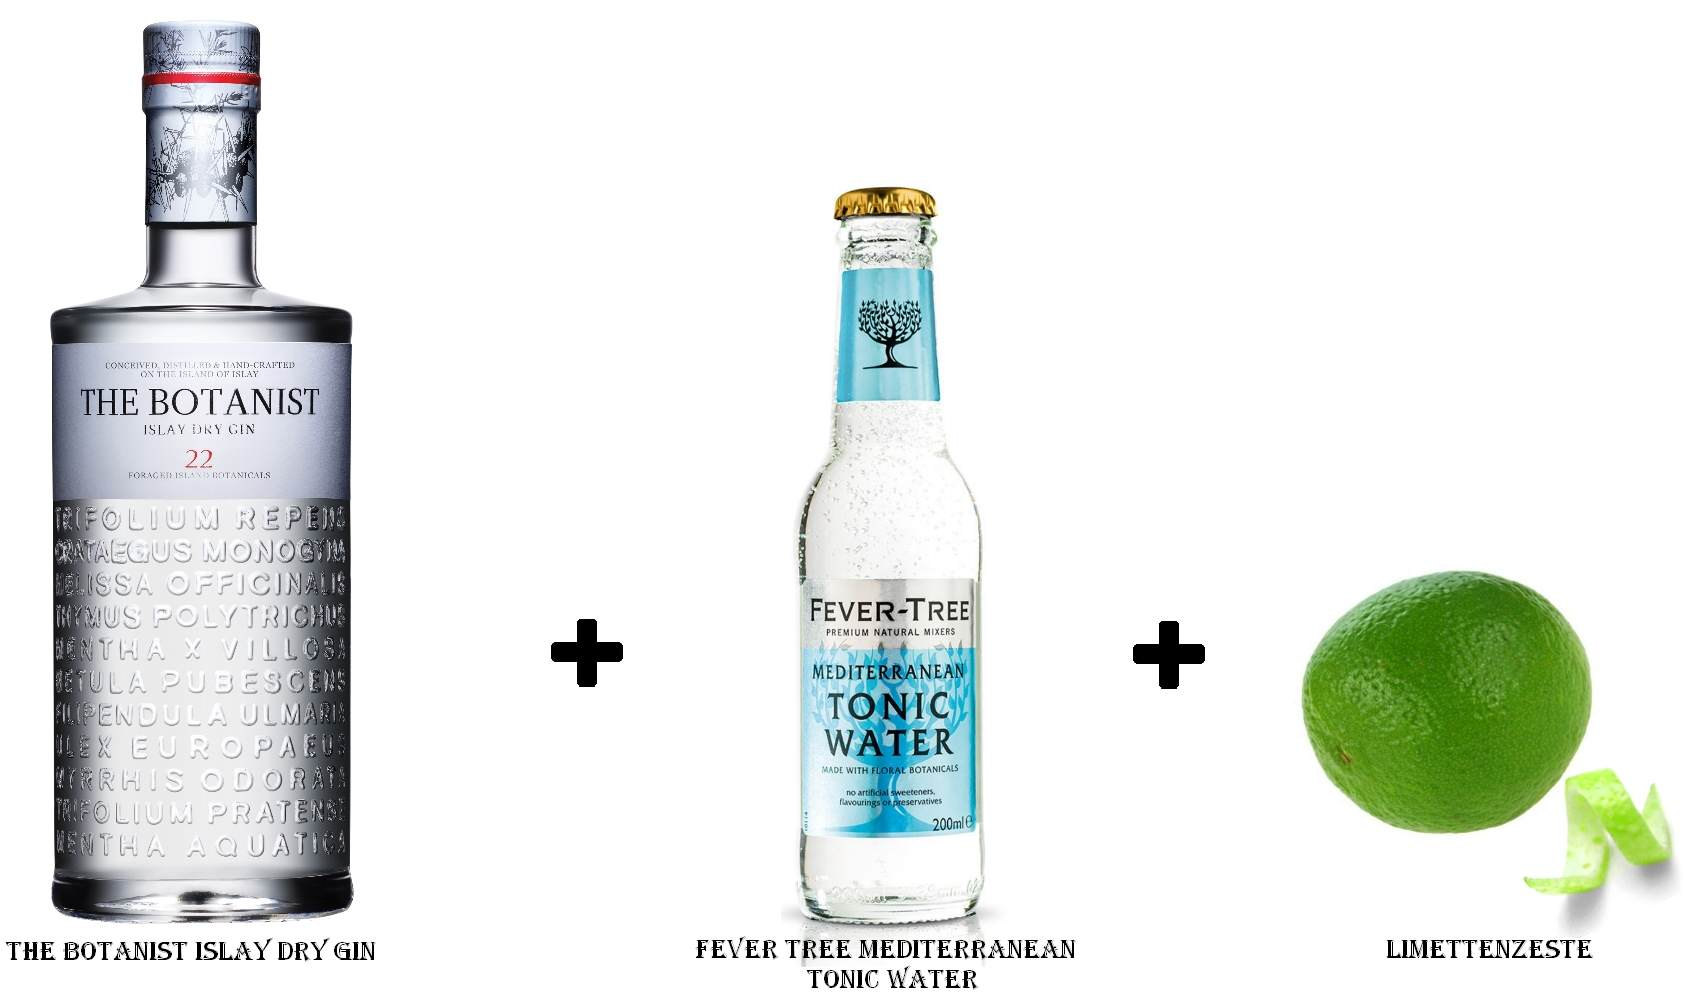 The Botanist Islay Dry Gin + Fever Tree Mediterranean Tonic Water + Limettenzeste